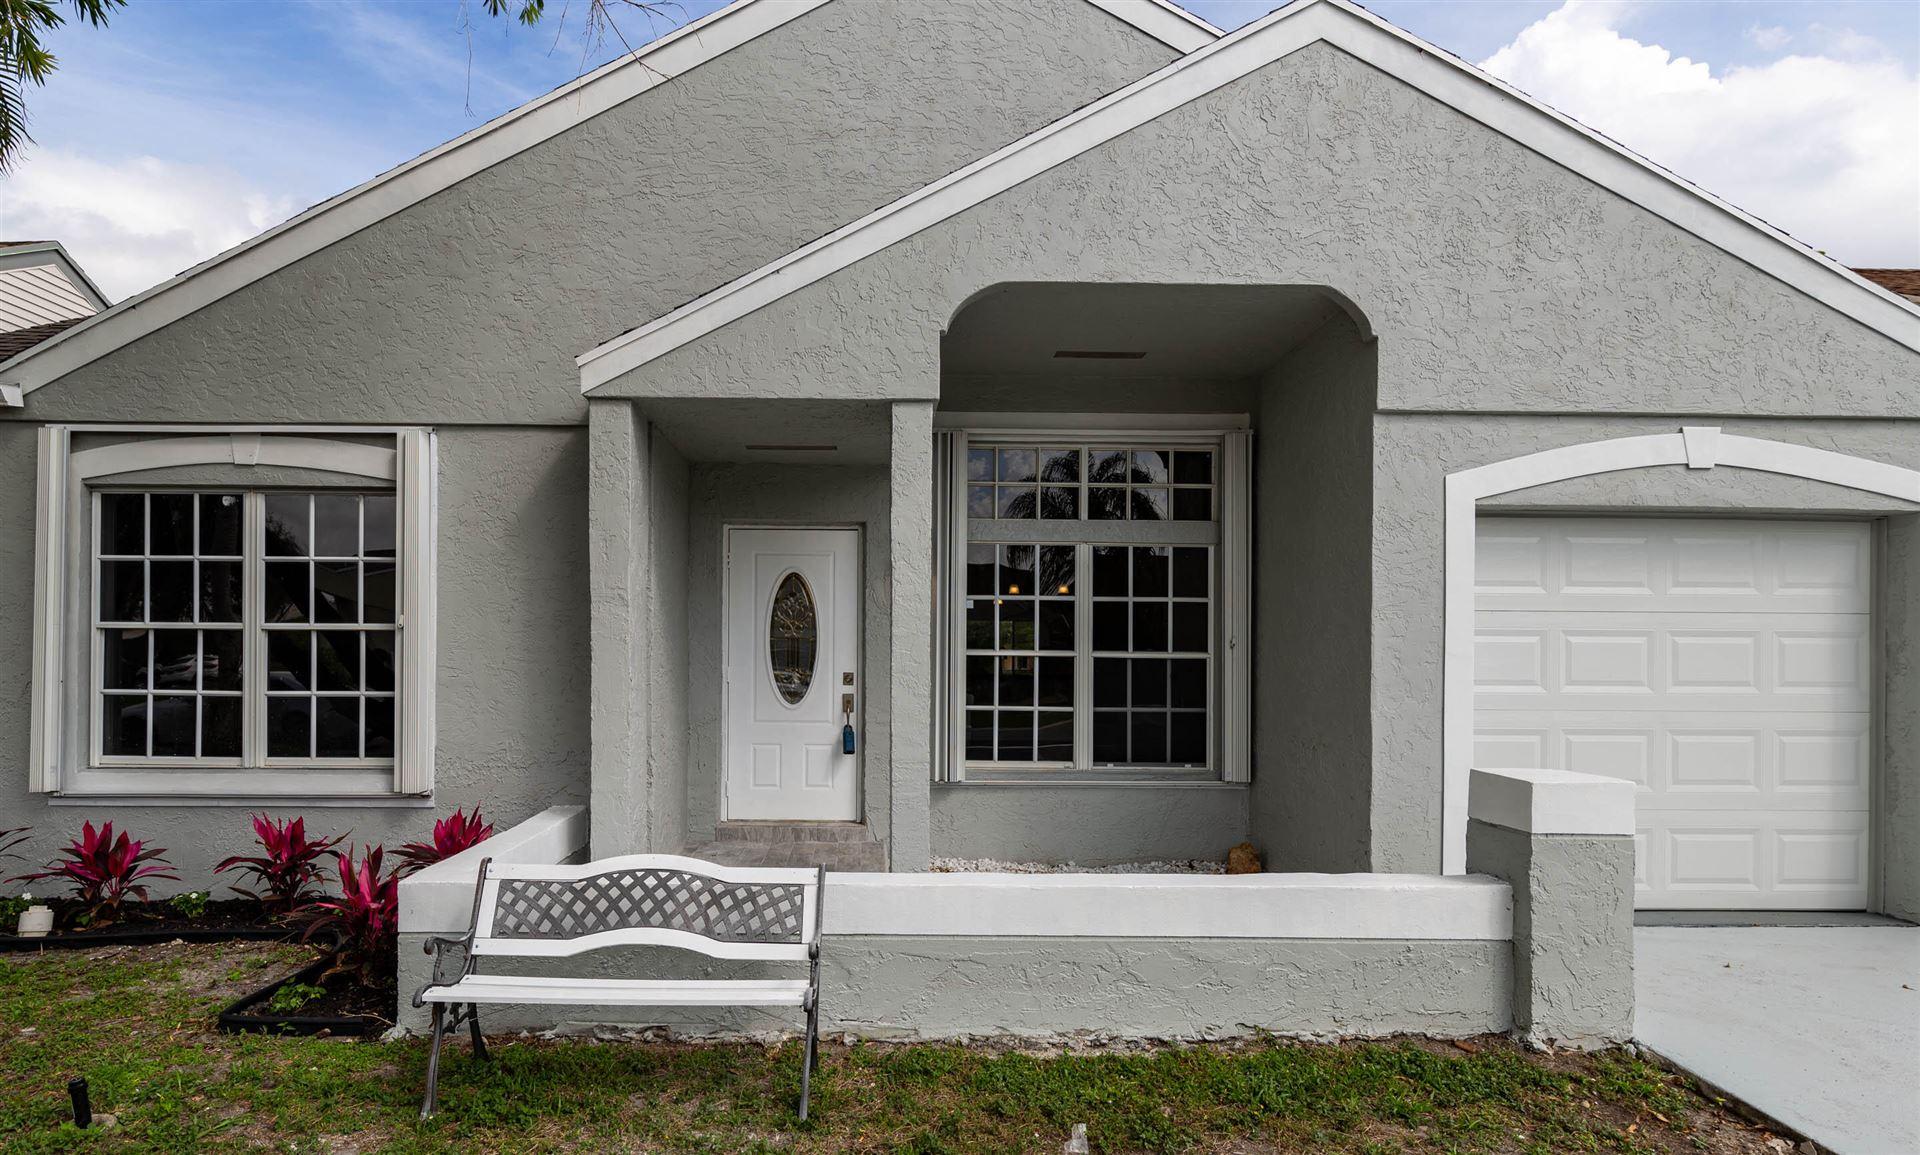 Photo of 23040 Floralwood Lane, Boca Raton, FL 33433 (MLS # RX-10696358)